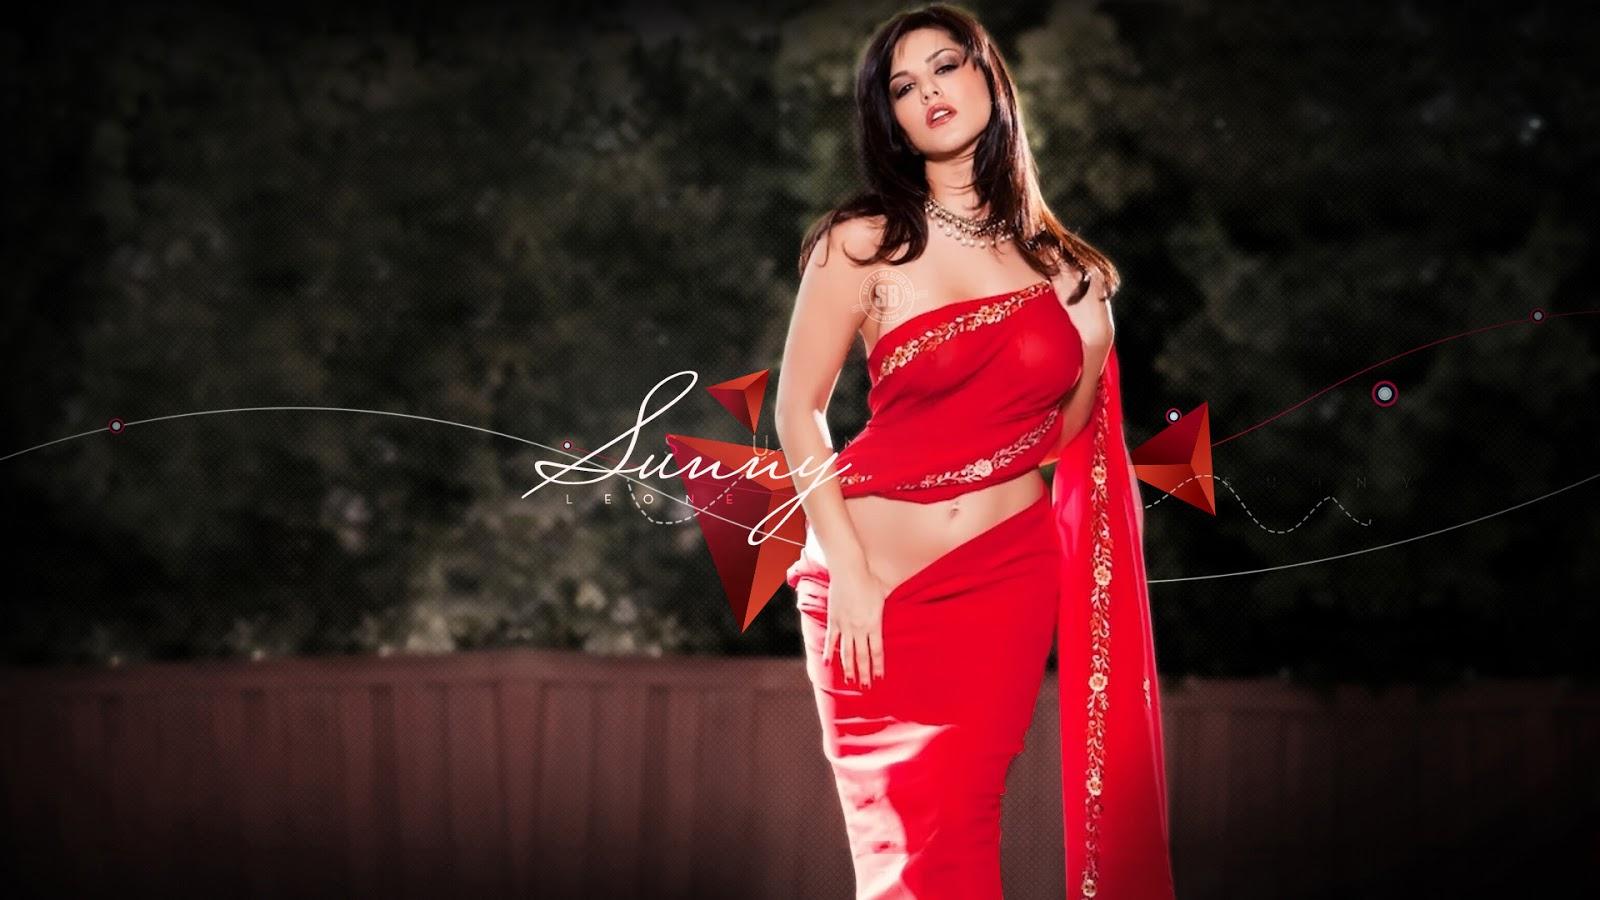 Sunny Leone Hottest Bikini Wallpapers Part 3 - Photo Buzzer-8148